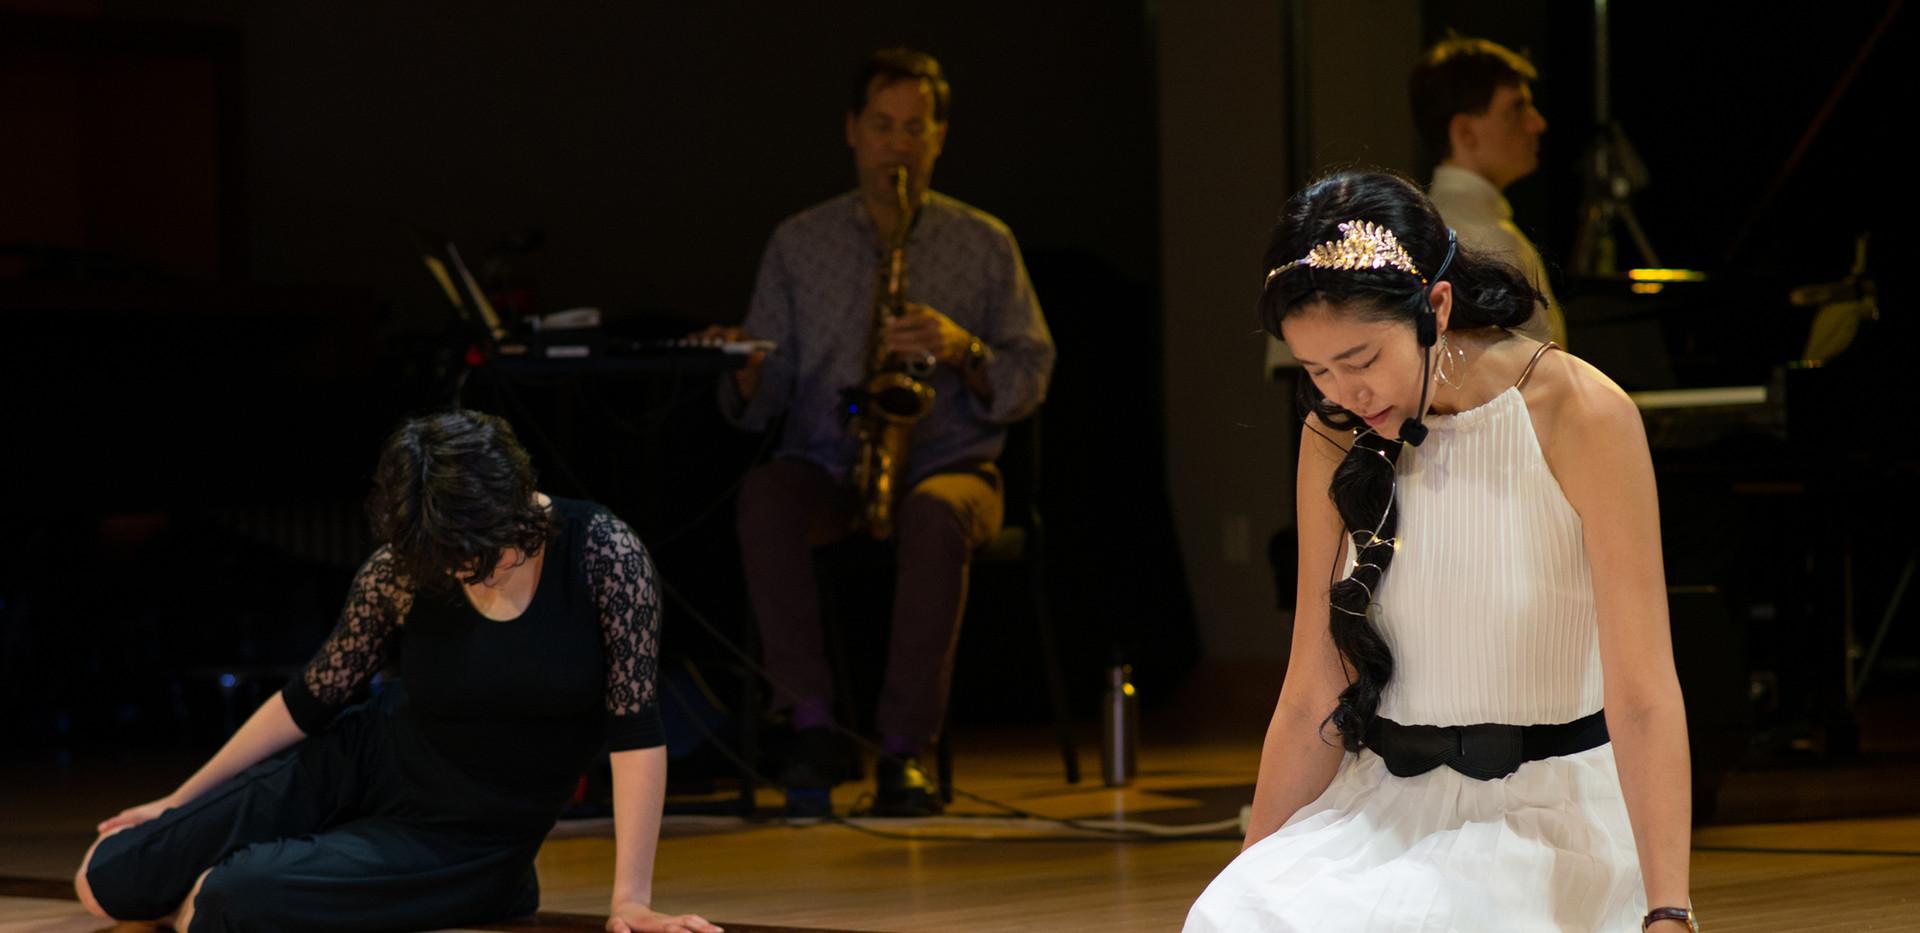 JoyHyunjuLee_RecitalShow-72.jpg